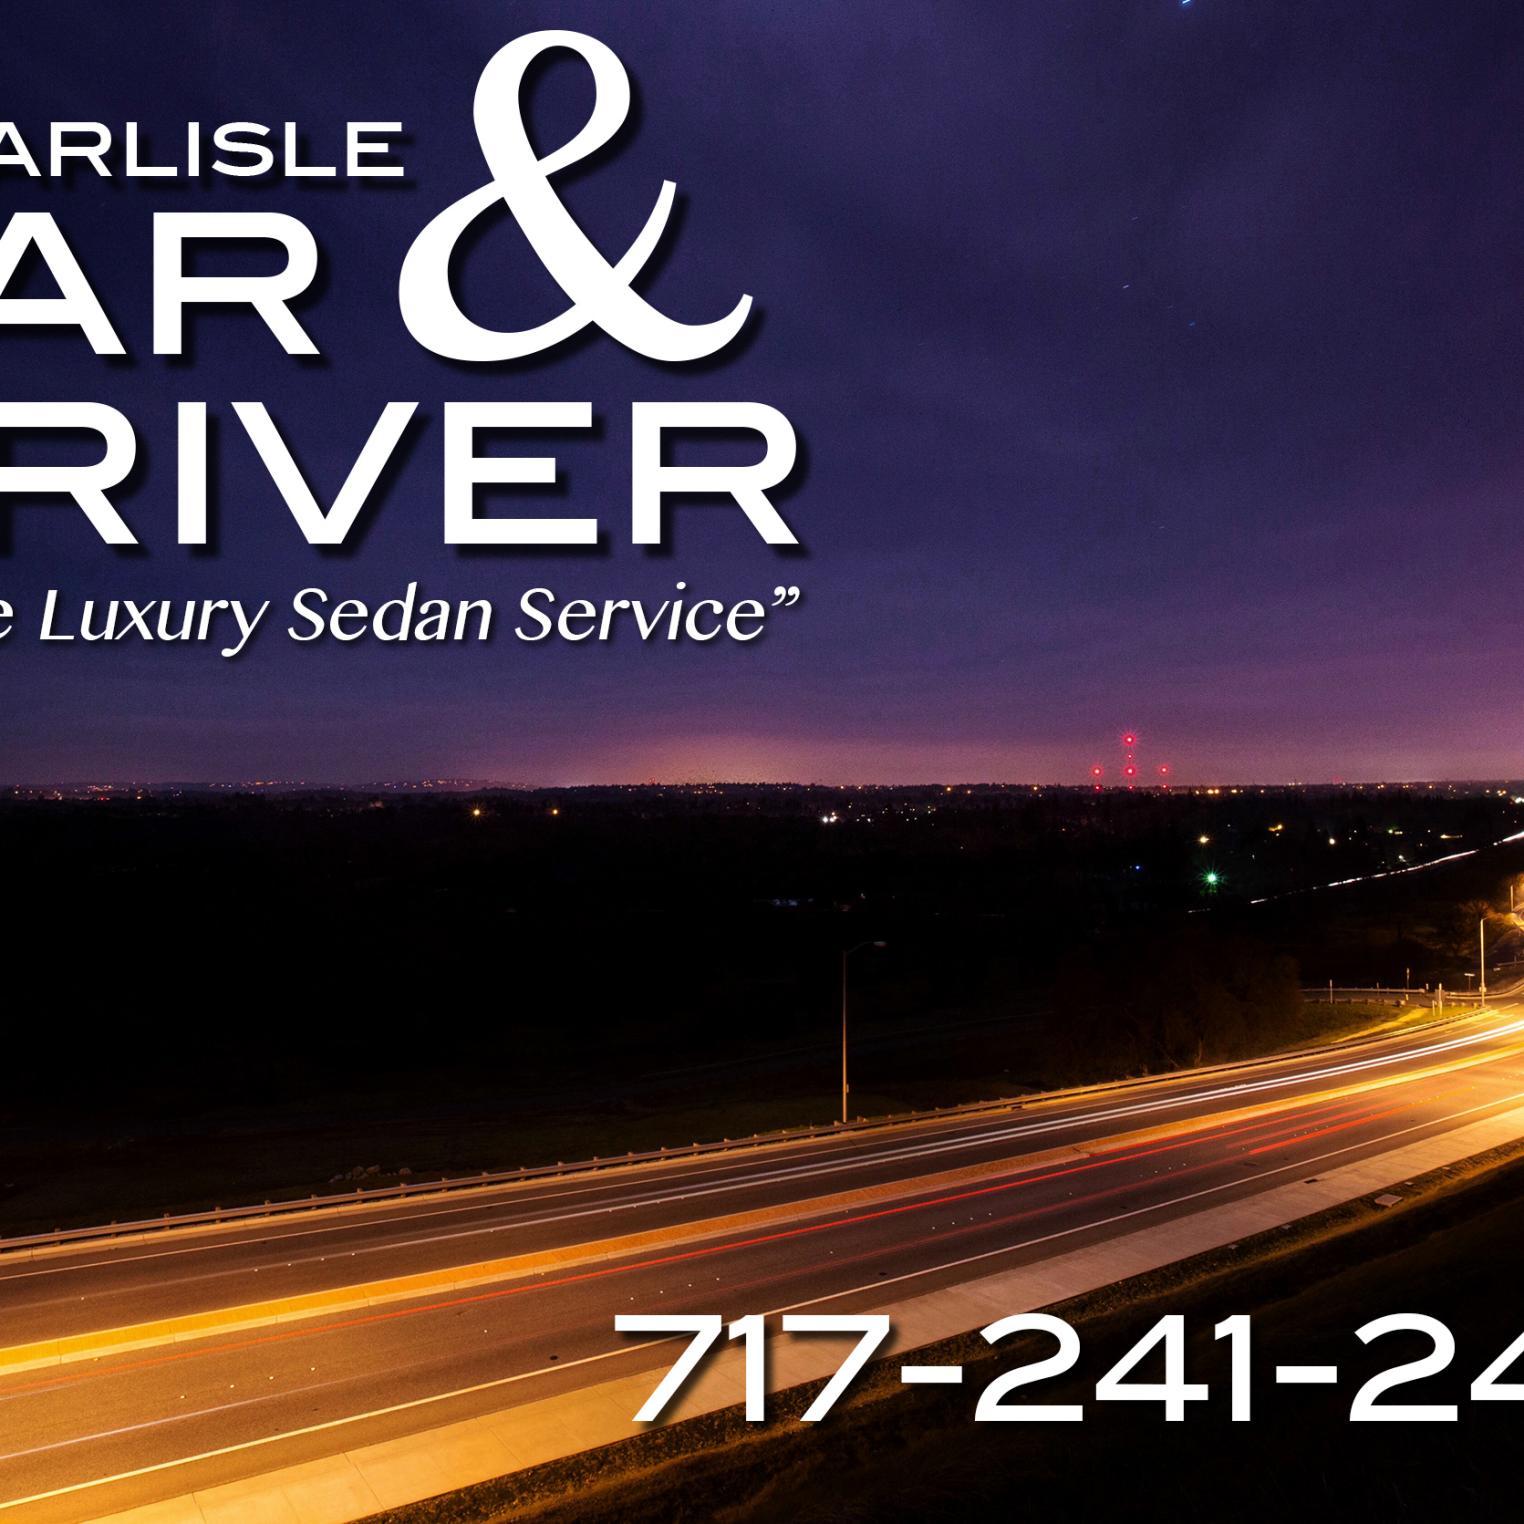 Carlisle Car & Driver Service